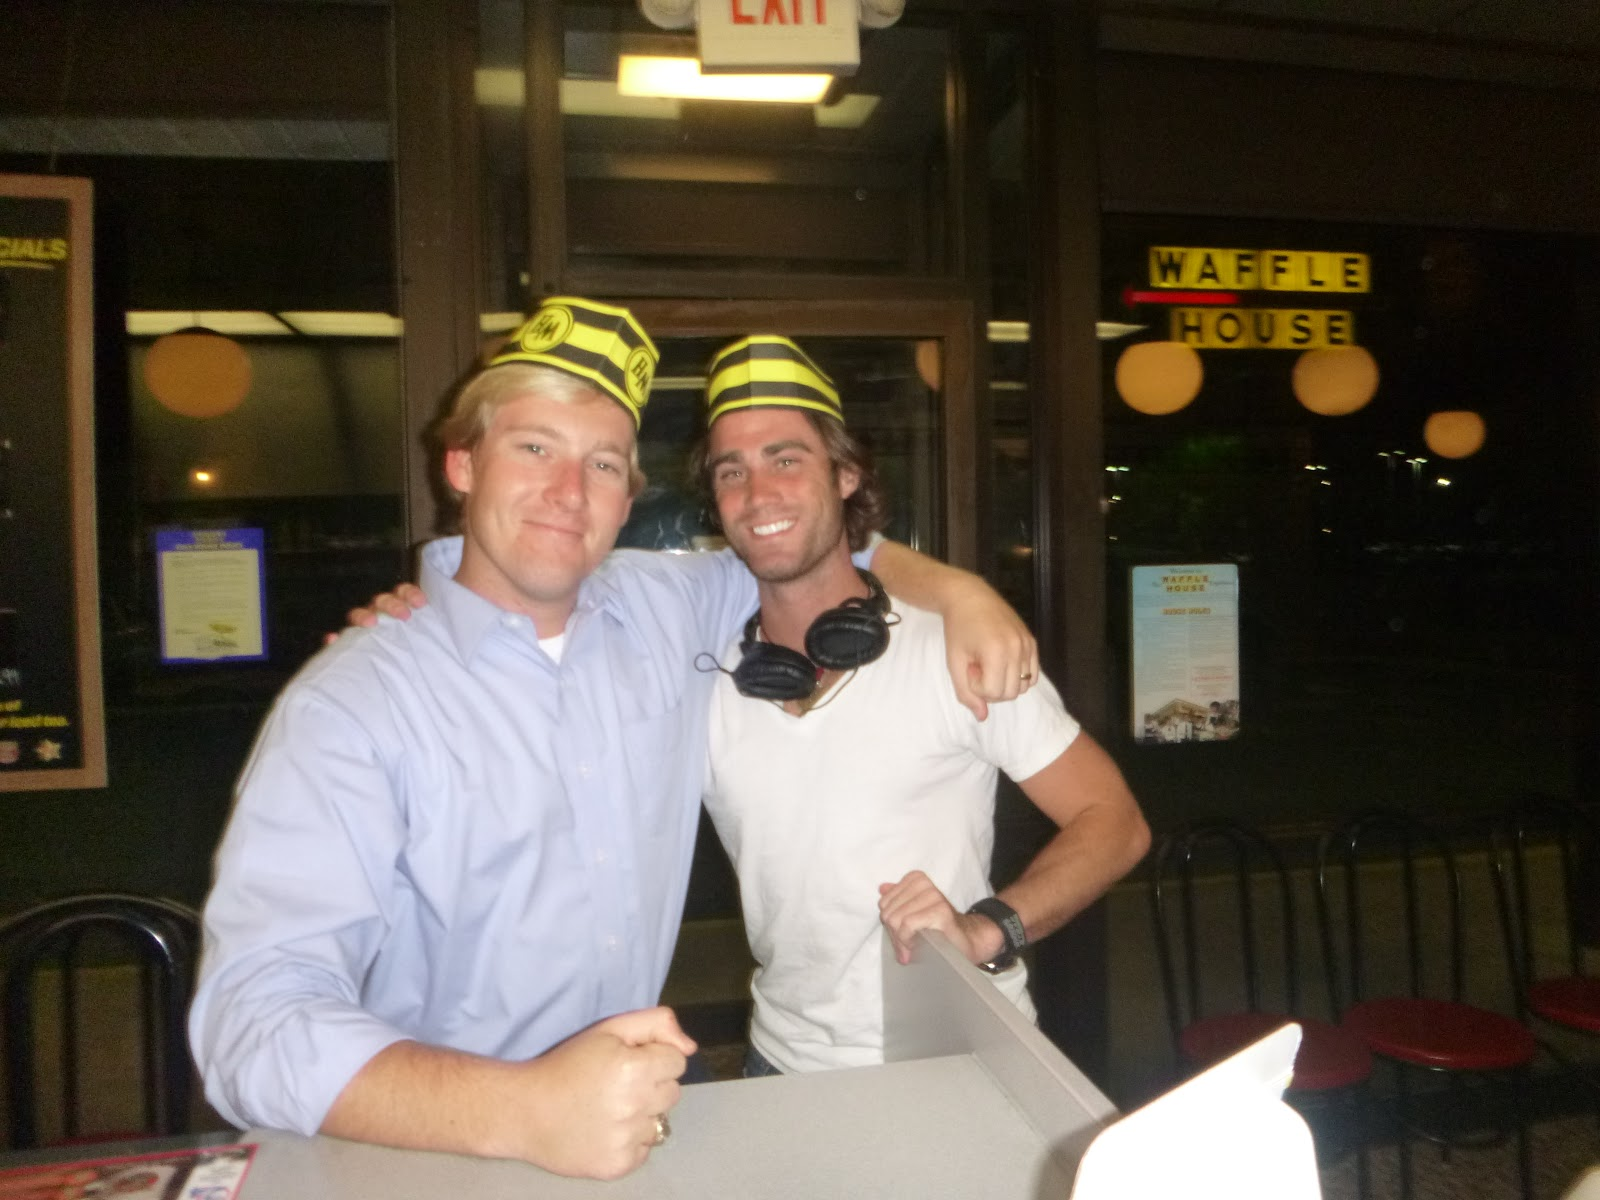 Waffle House Easley Sc